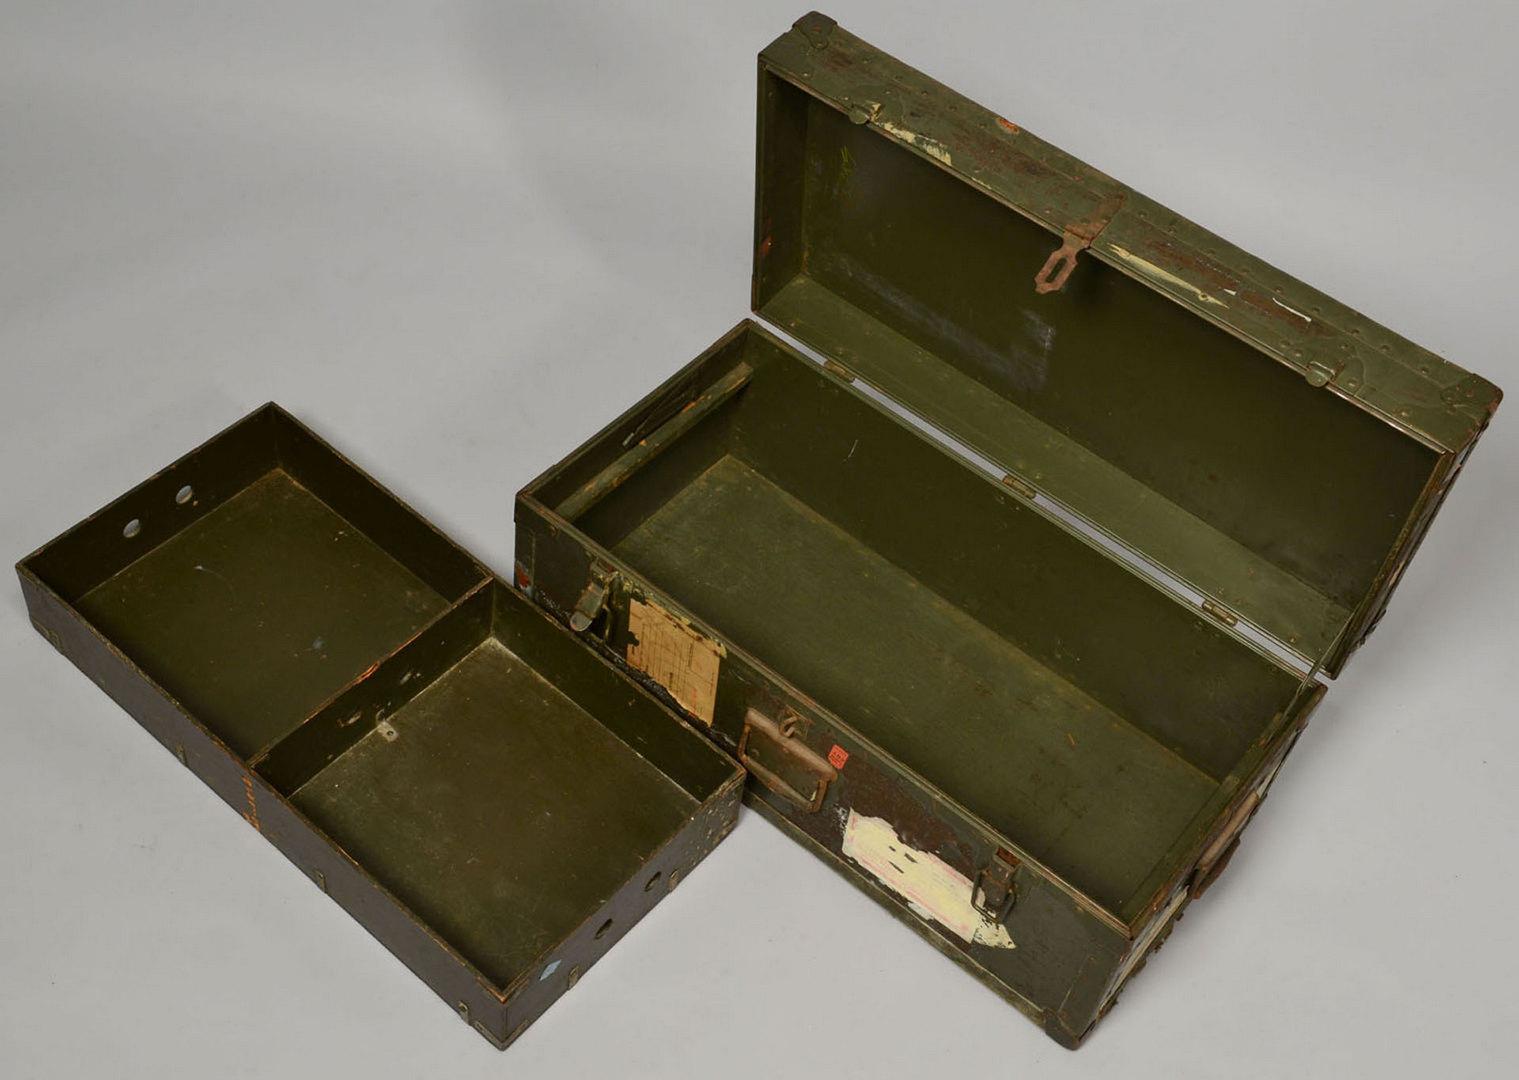 Lot 531 Military Items Field Desk Foot Locker Shells